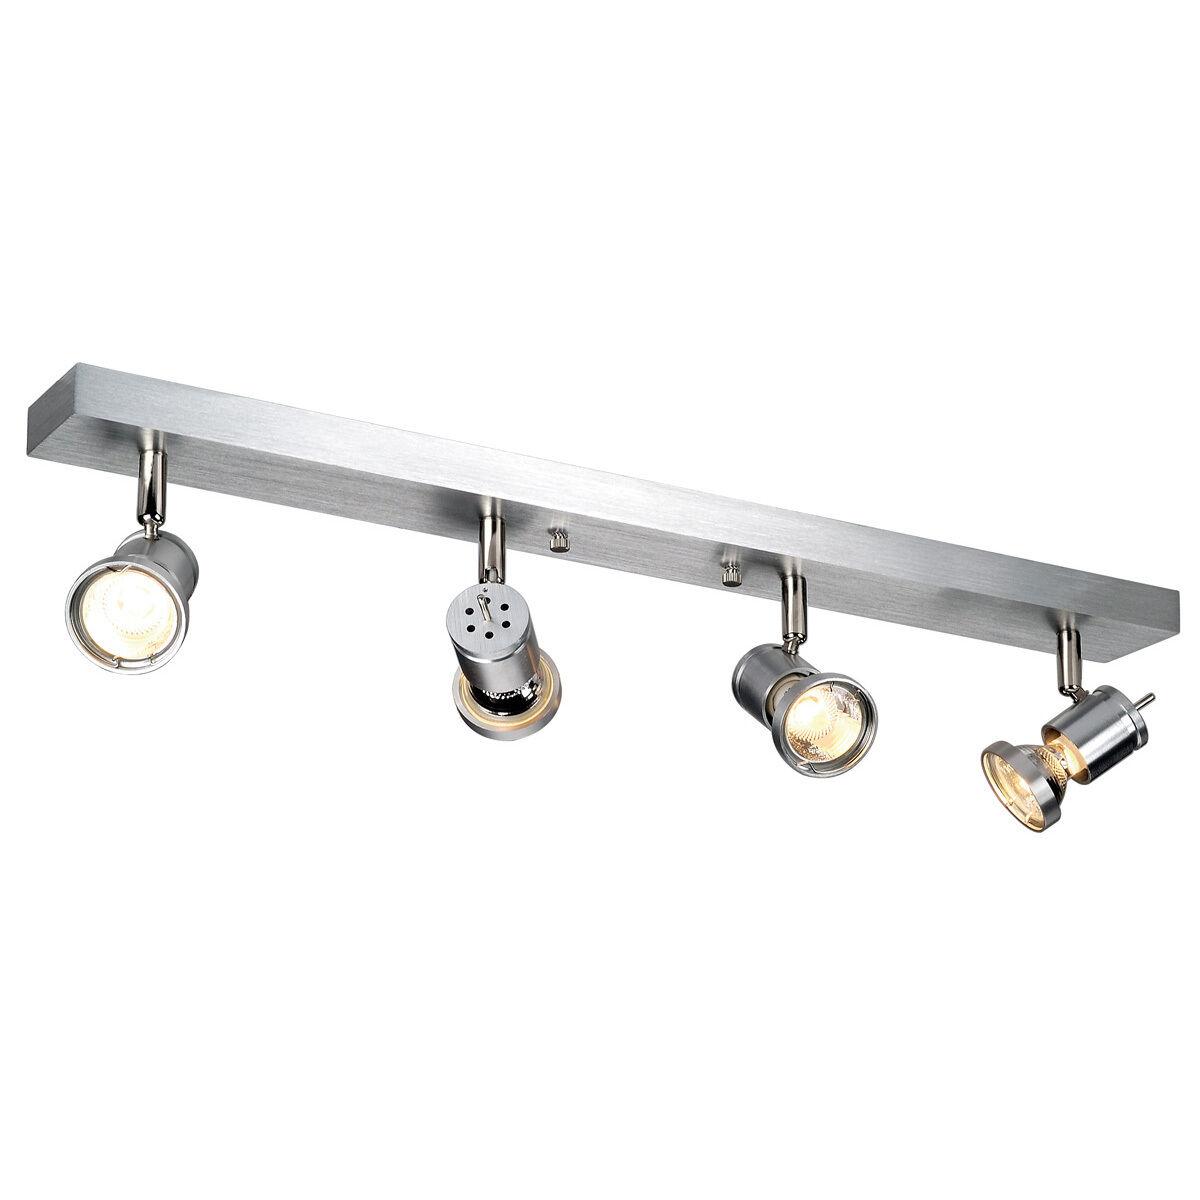 Intalite Asto IV Mur et Brossé,4x Lumière Plafond,Aluminium Brossé,4x et GU10,Maximum 4x 75W 8e6f66